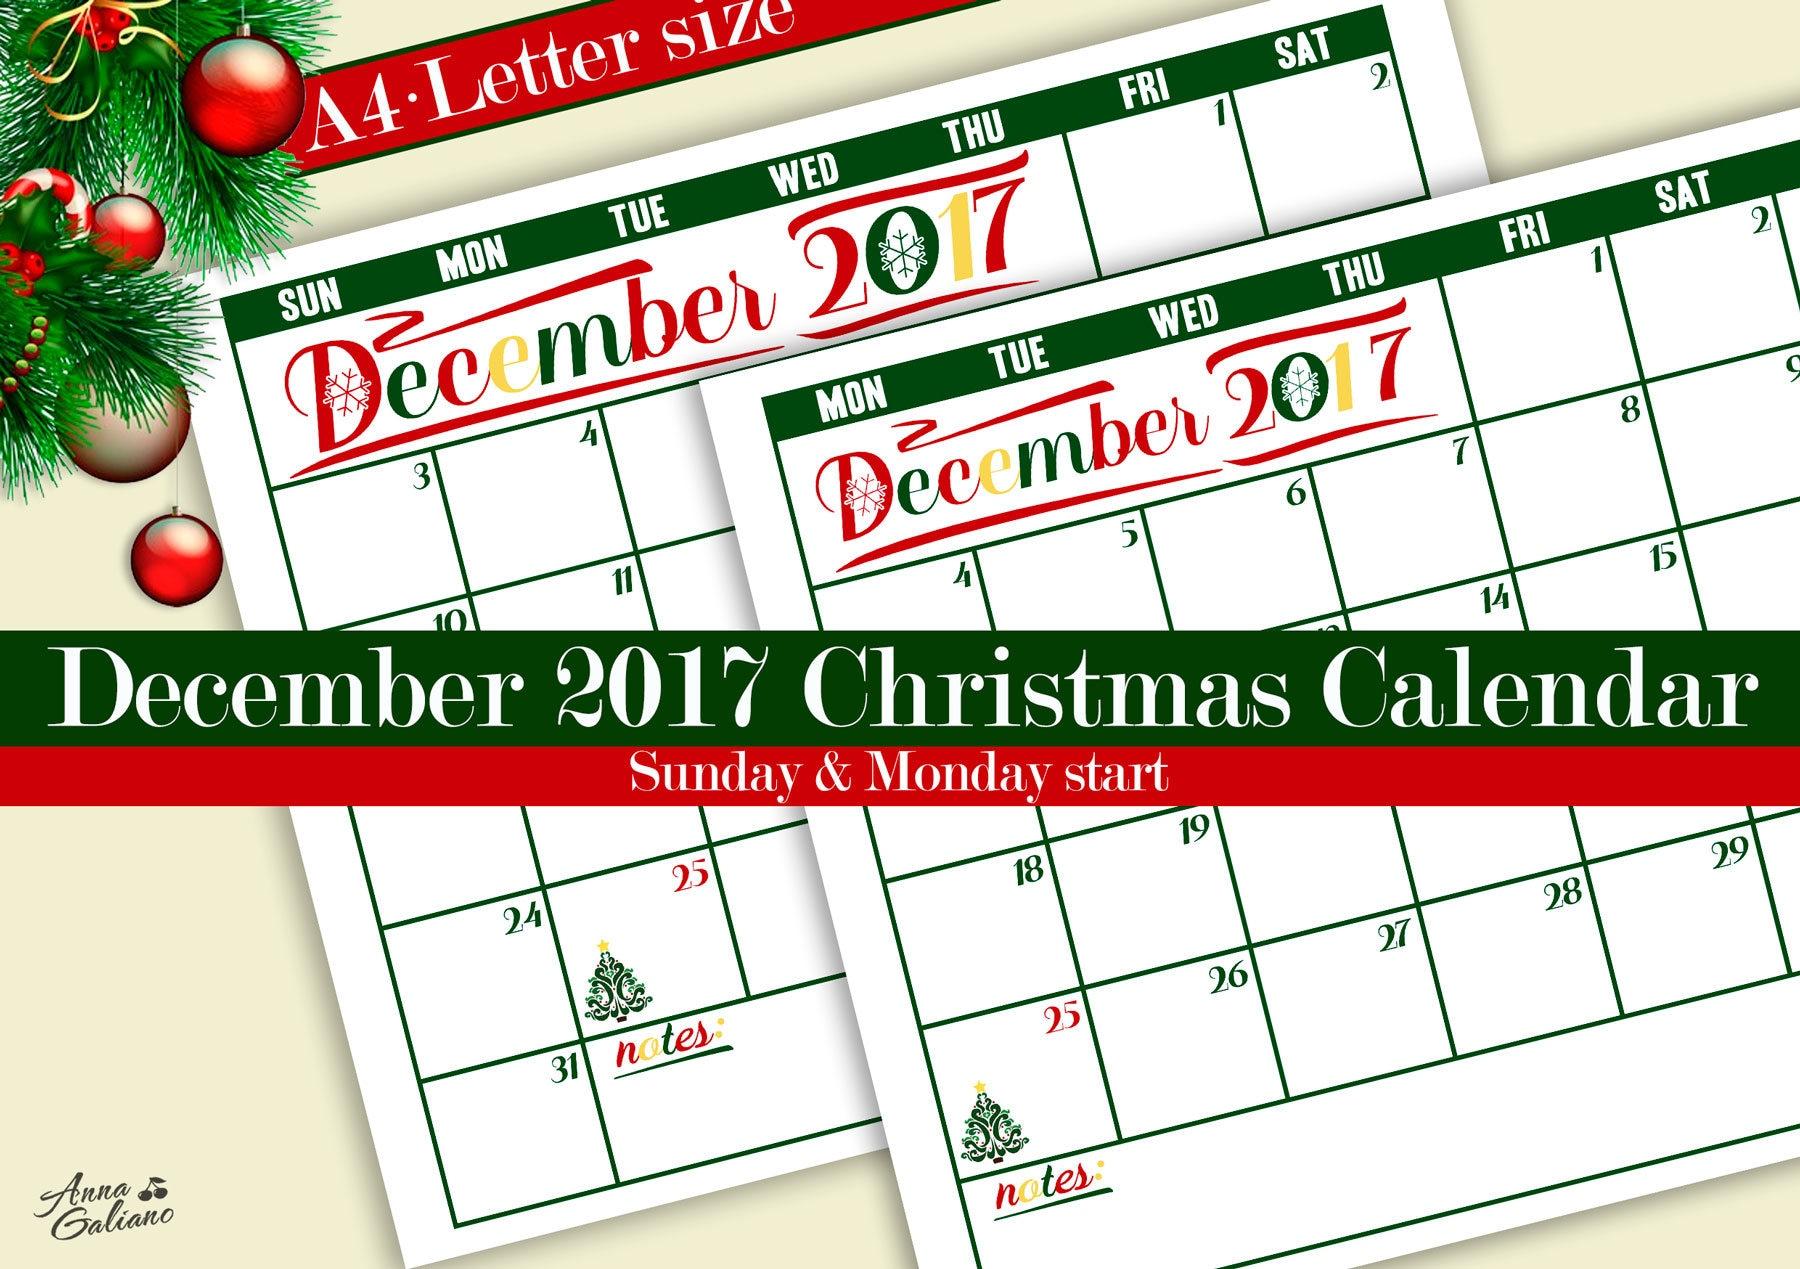 Christmas Calendar 2017 : December christmas calendar printable